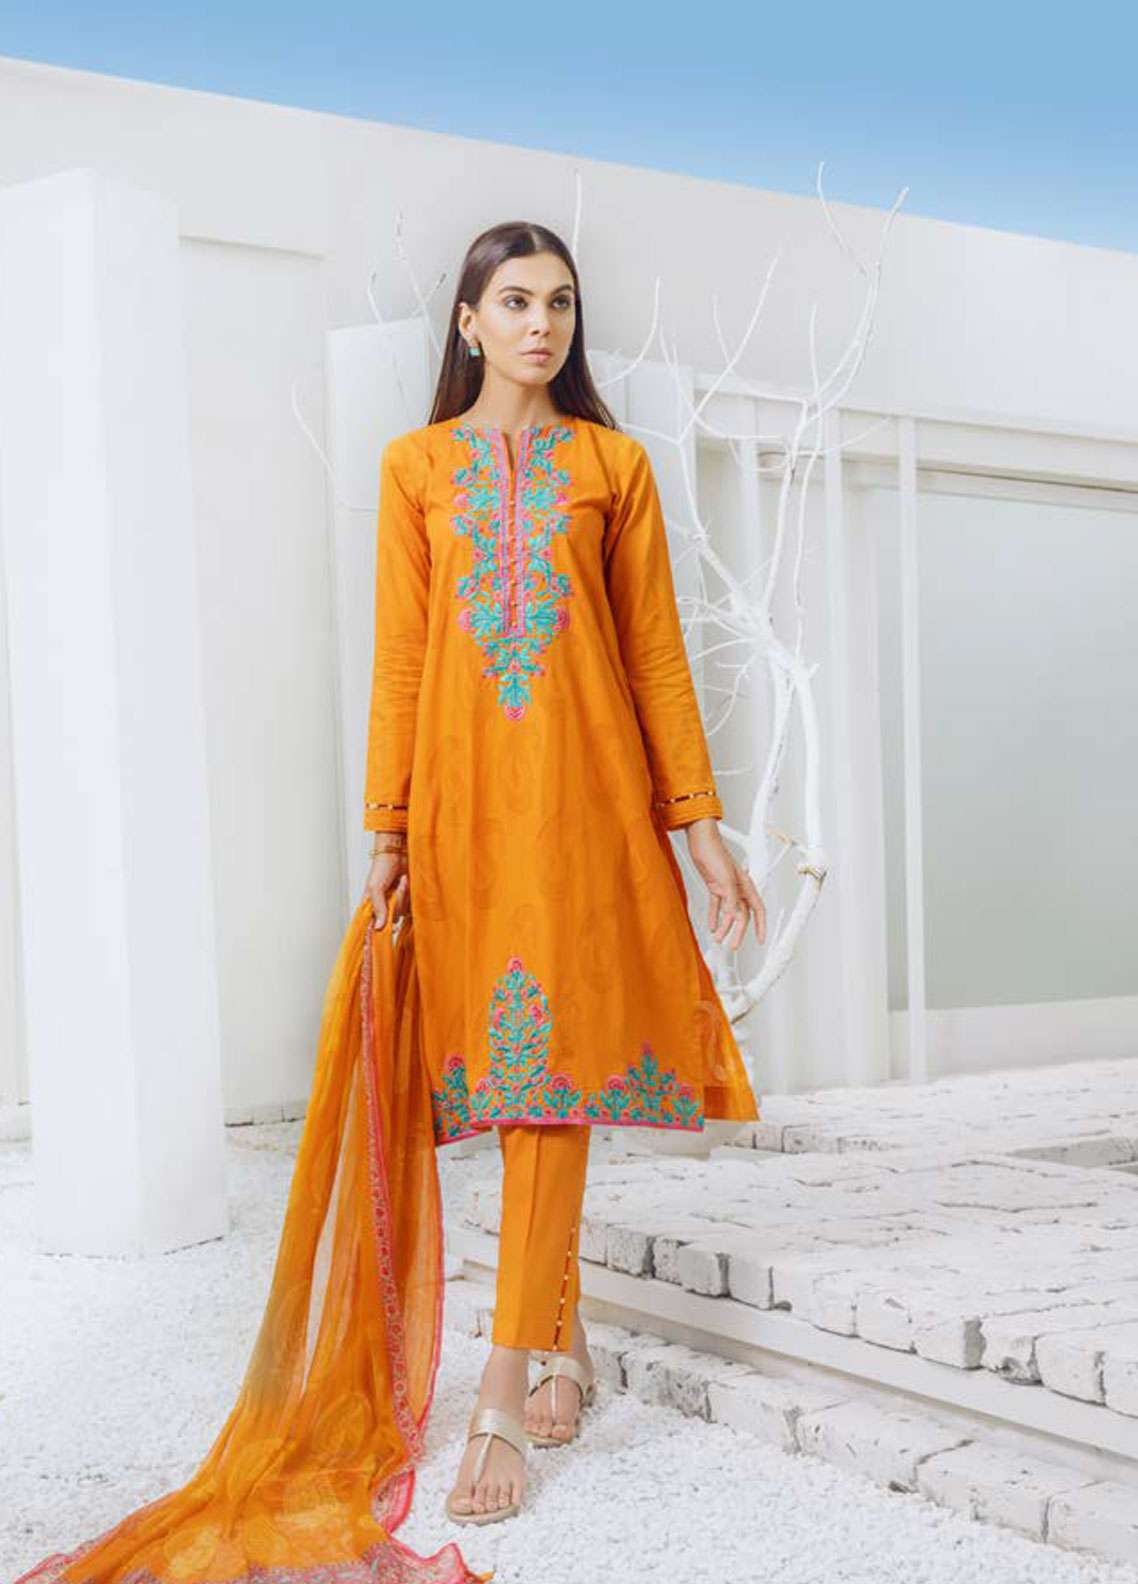 Orient Textile Embroidered Jacquard Unstitched 3 Piece Suit OT19-L2 137 B - Spring / Summer Collection